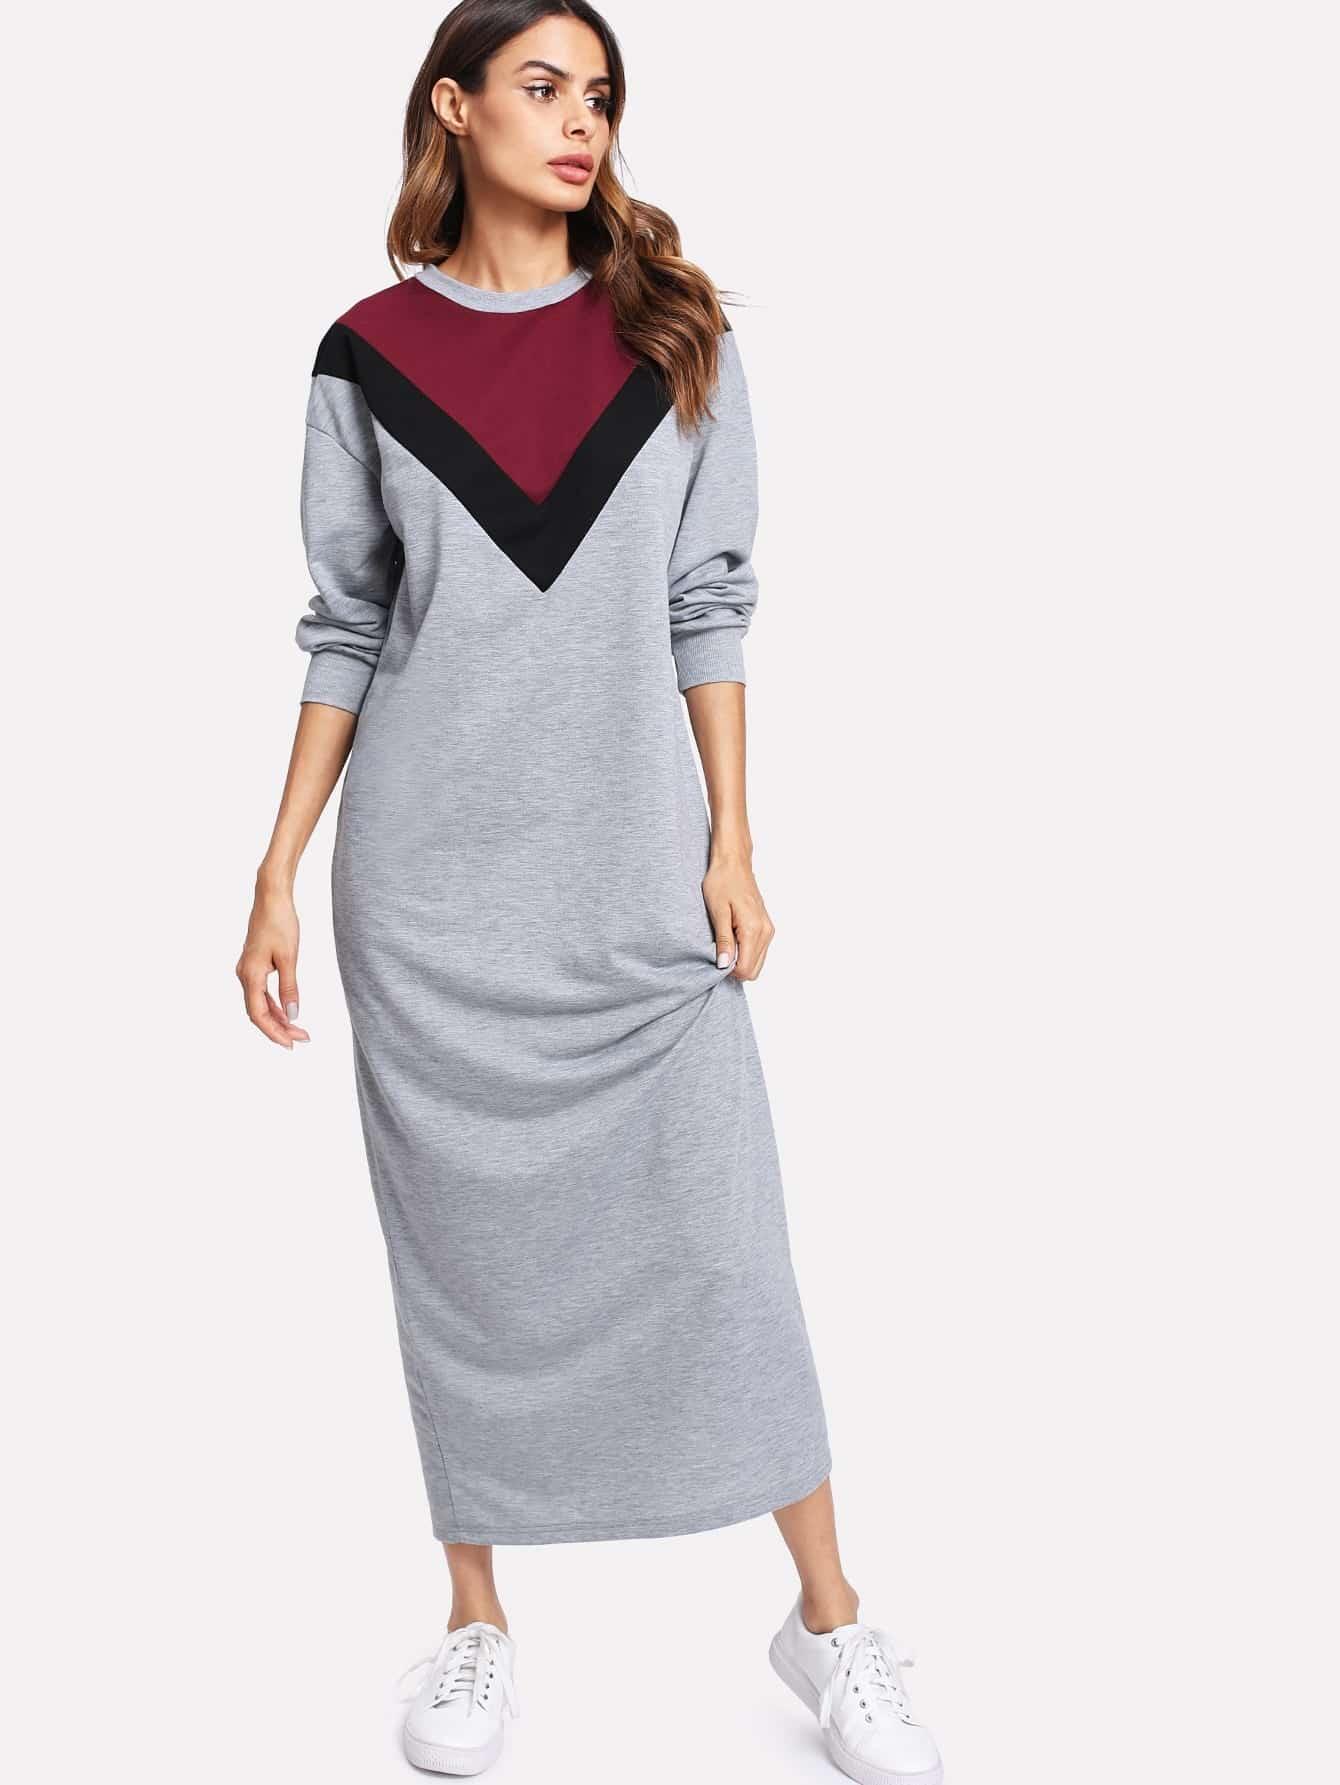 Contrast Chevron Panel Marled Sweatshirt Dress drop shoulder marled sweatshirt dress with corset belt